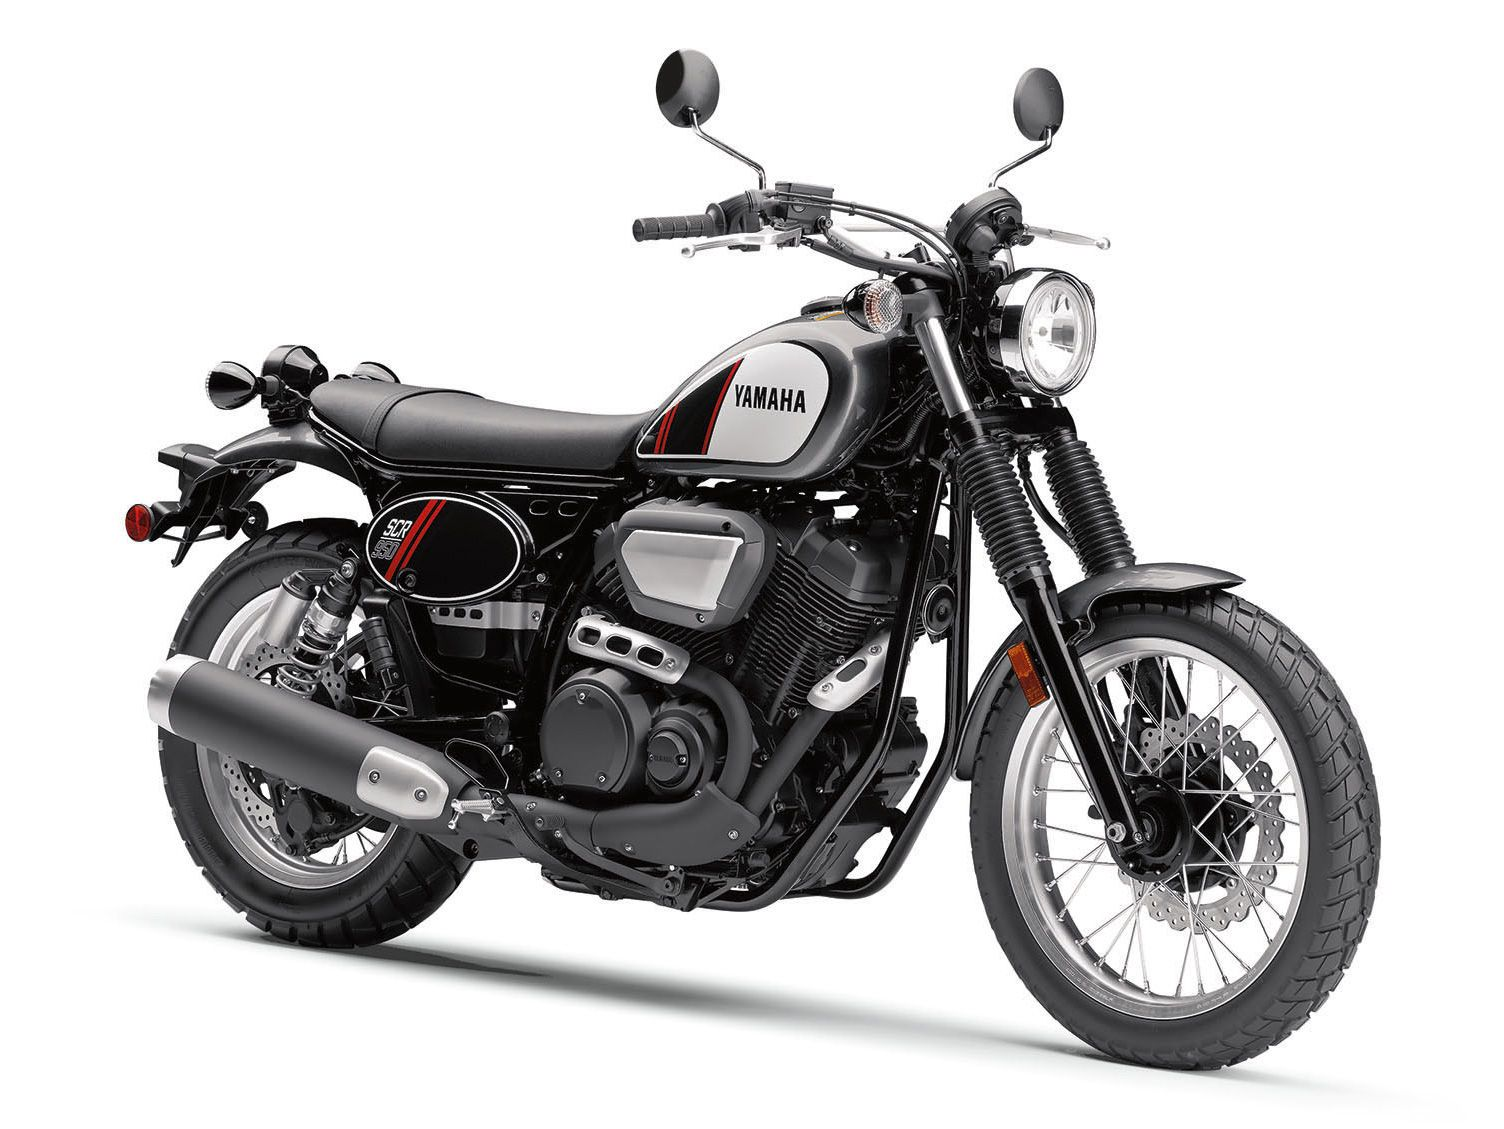 2017 Yamaha Scr950 Scrambler First Look Review Cycle World